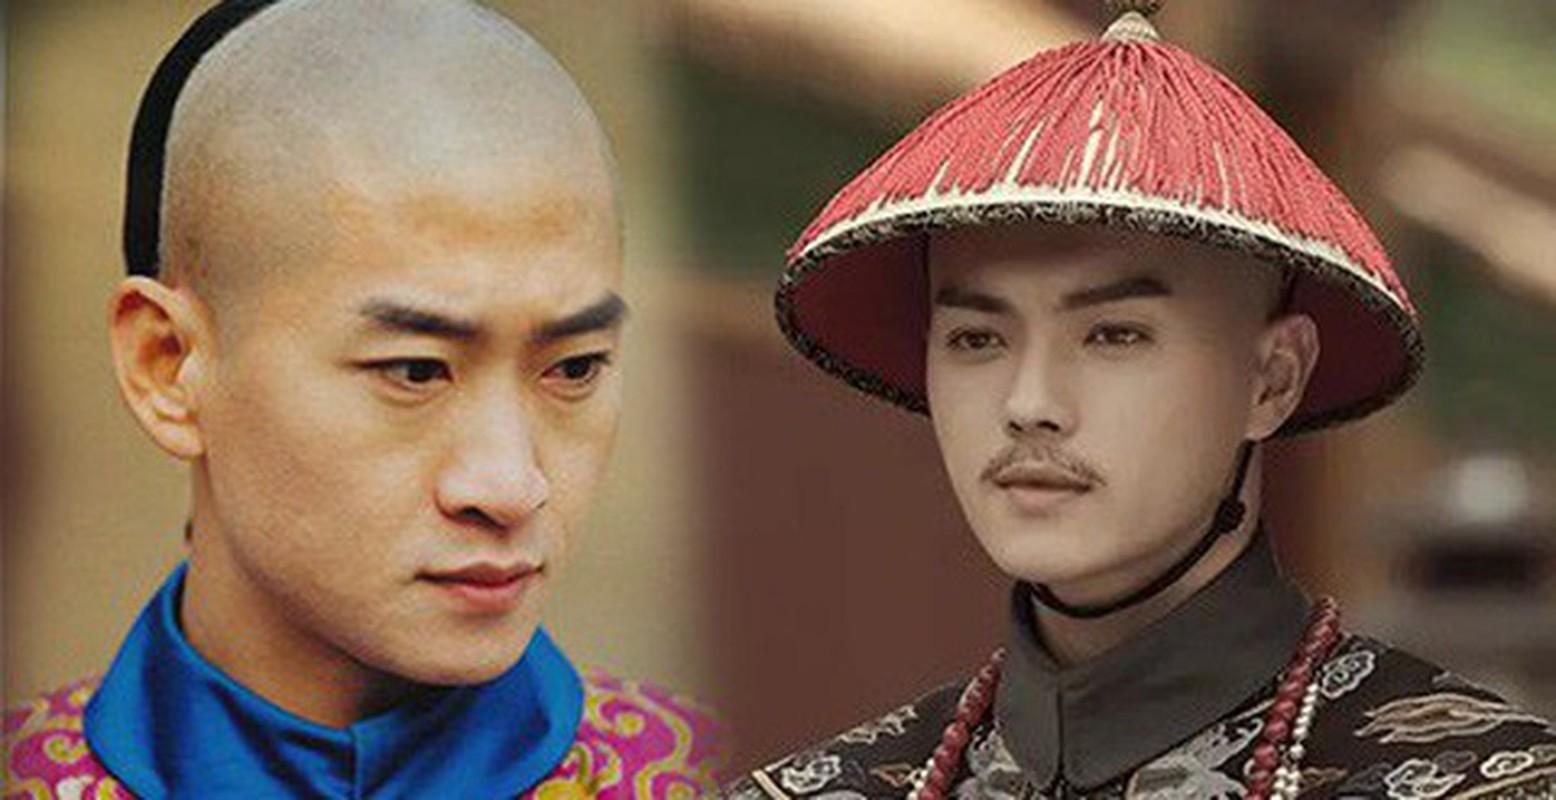 Su that gay soc kieu toc tet duoi sam cua nam gioi nha Thanh-Hinh-9